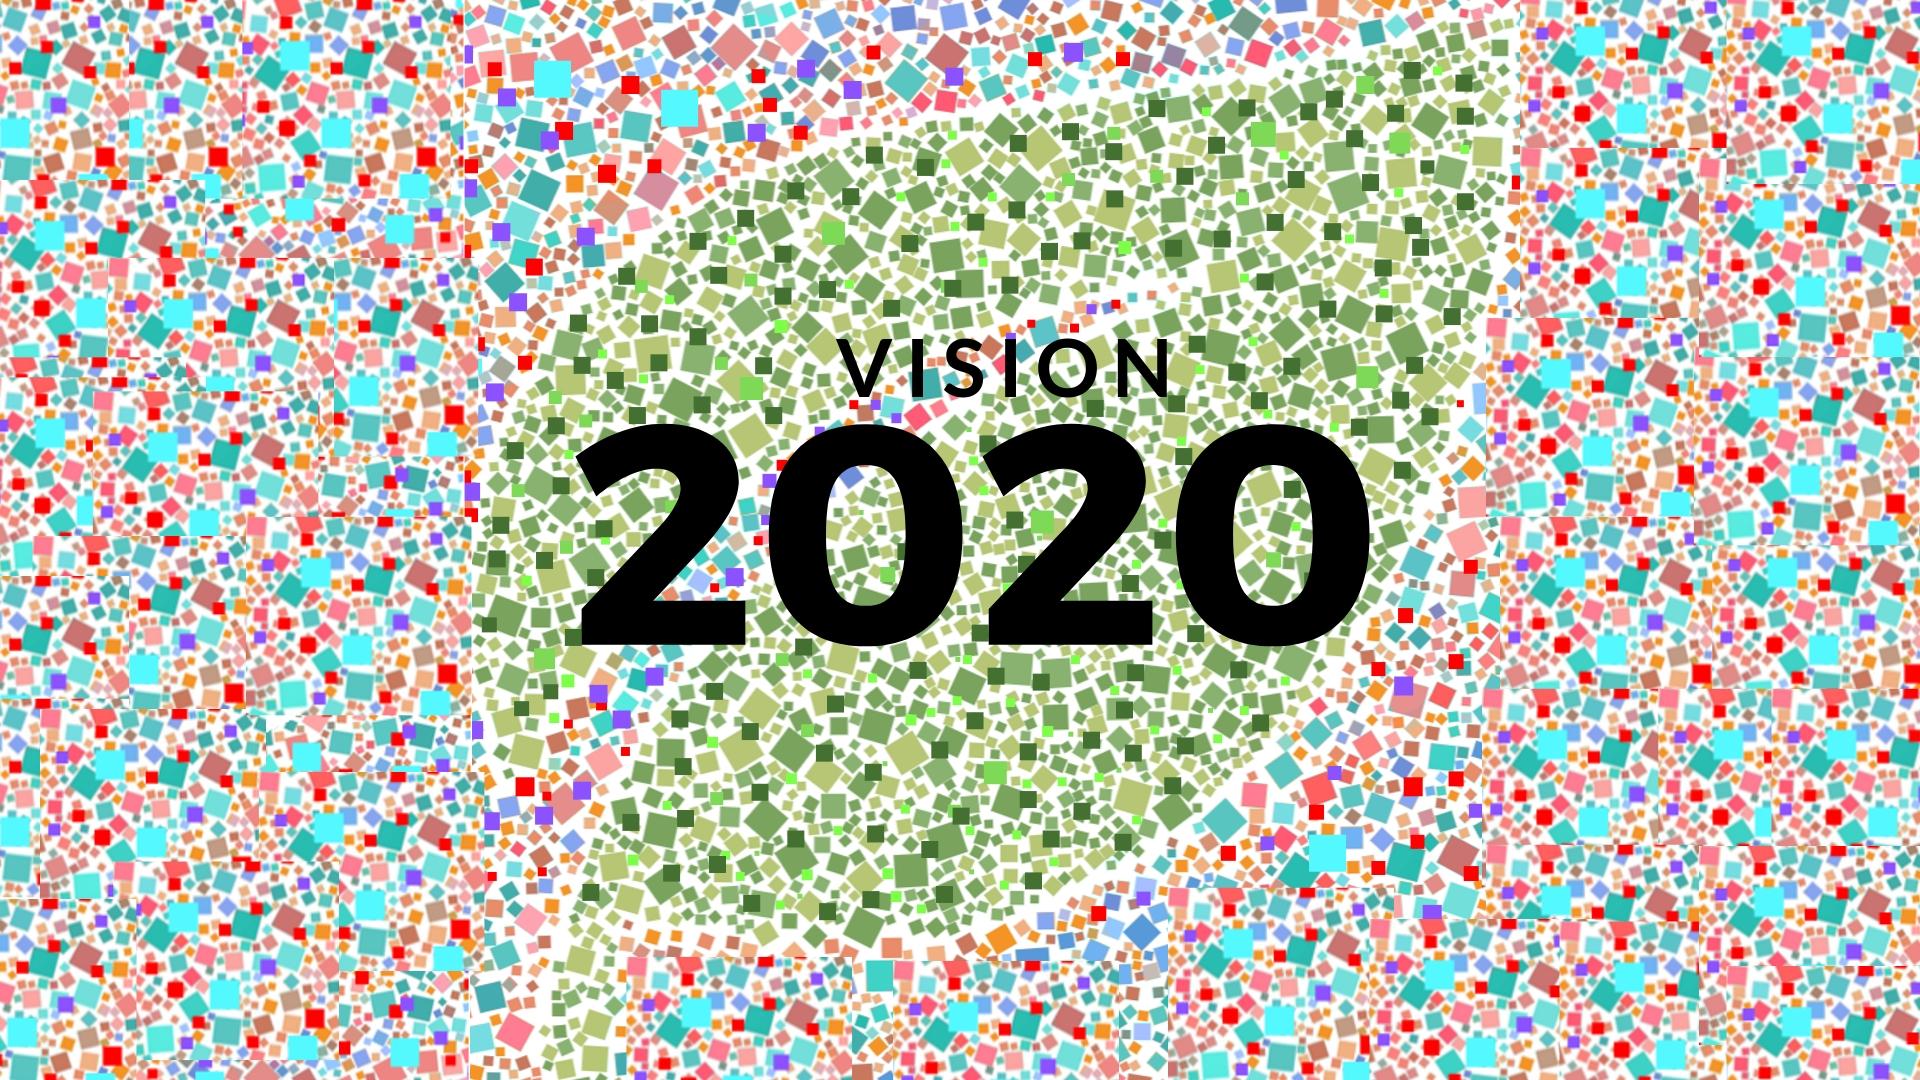 Adults_Vision_2020_YEG.jpg